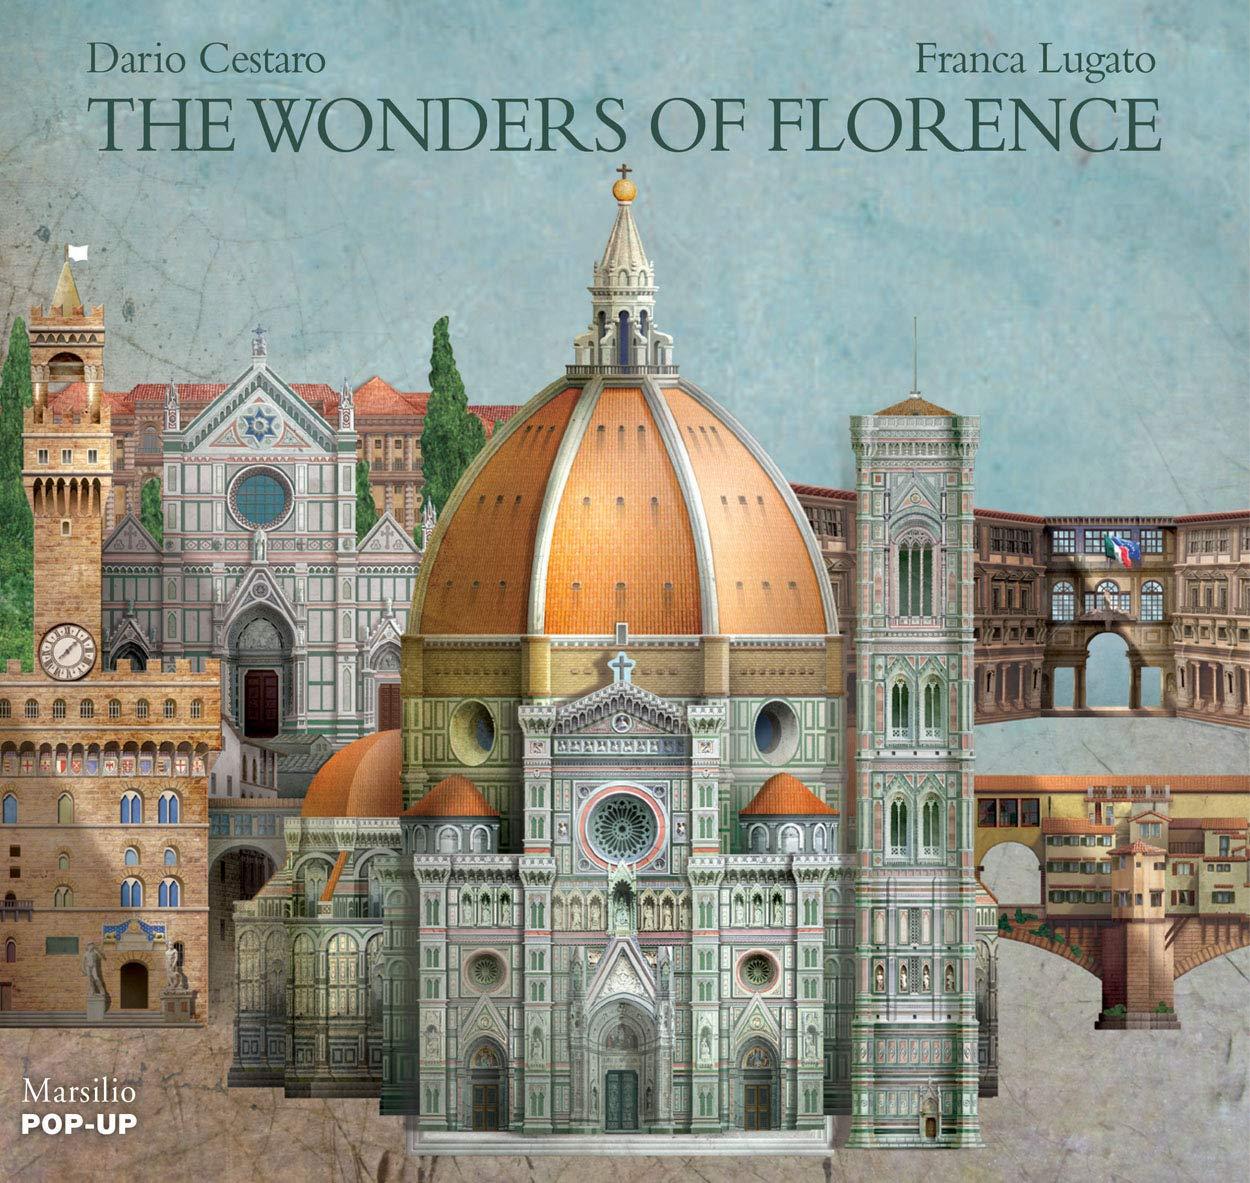 The wonders of Florence. Libro pop-up. Ediz. illustrata (Libri illustrati) [Idioma Inglés]